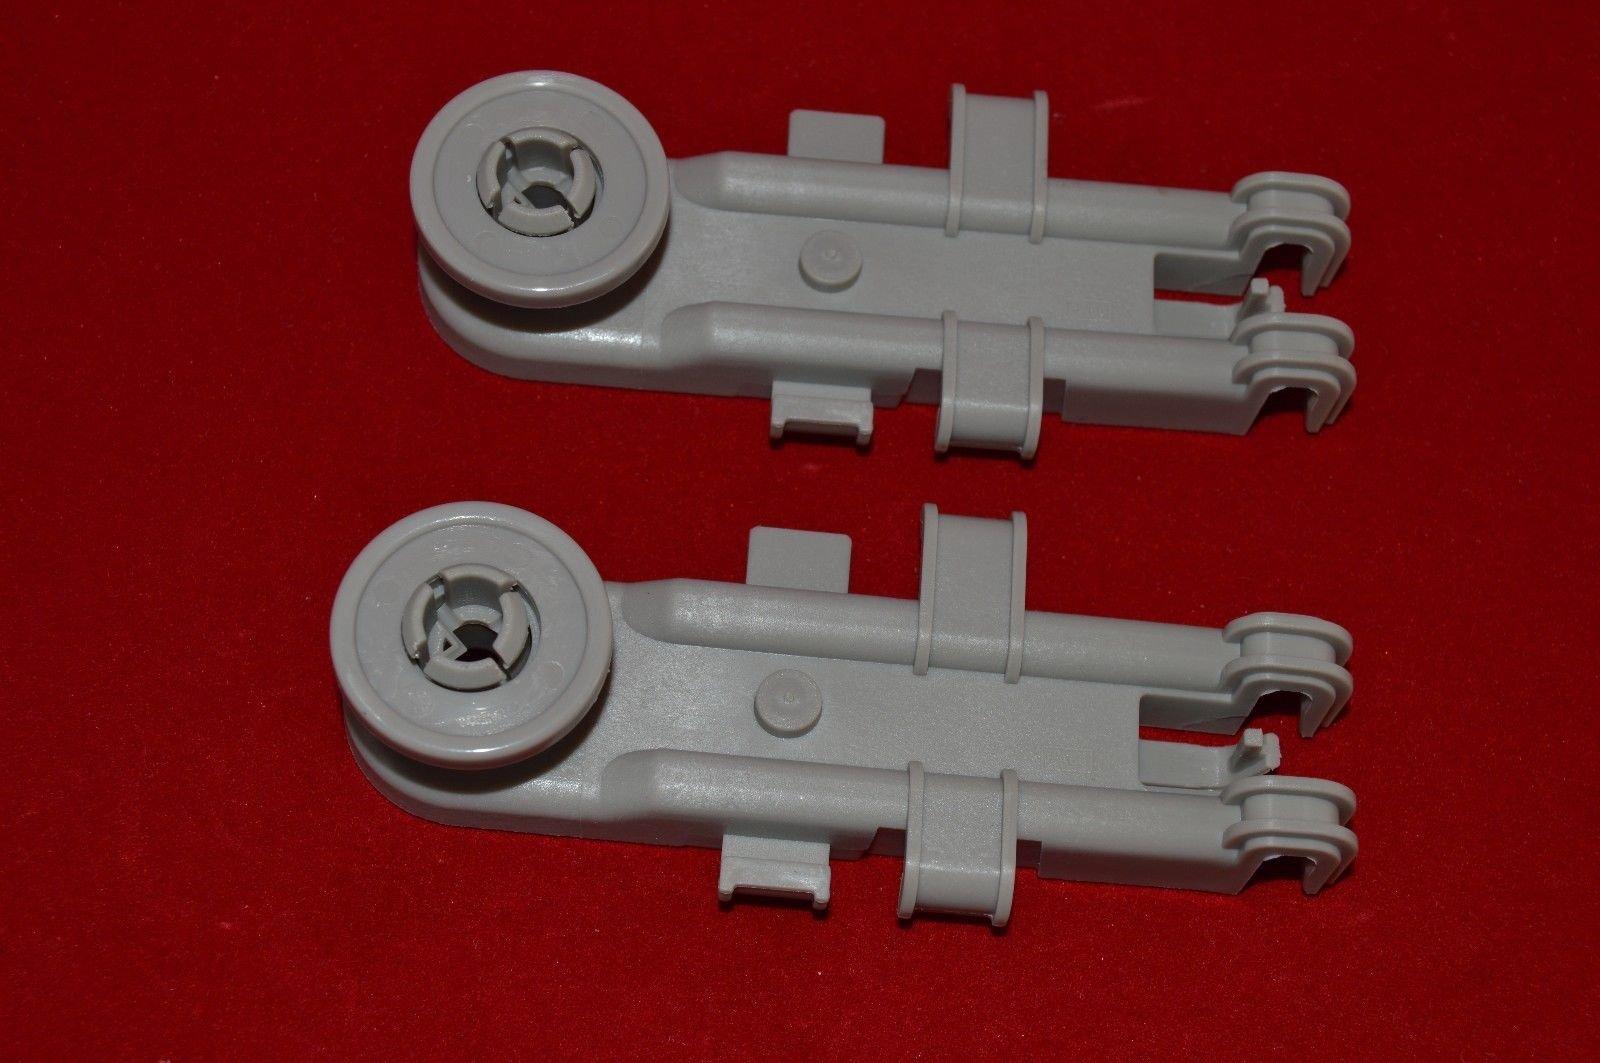 Pokin 8268743 Upper Dish rack Wheel for Whirlpool, Kenmore, KitchenAid 2 Pack